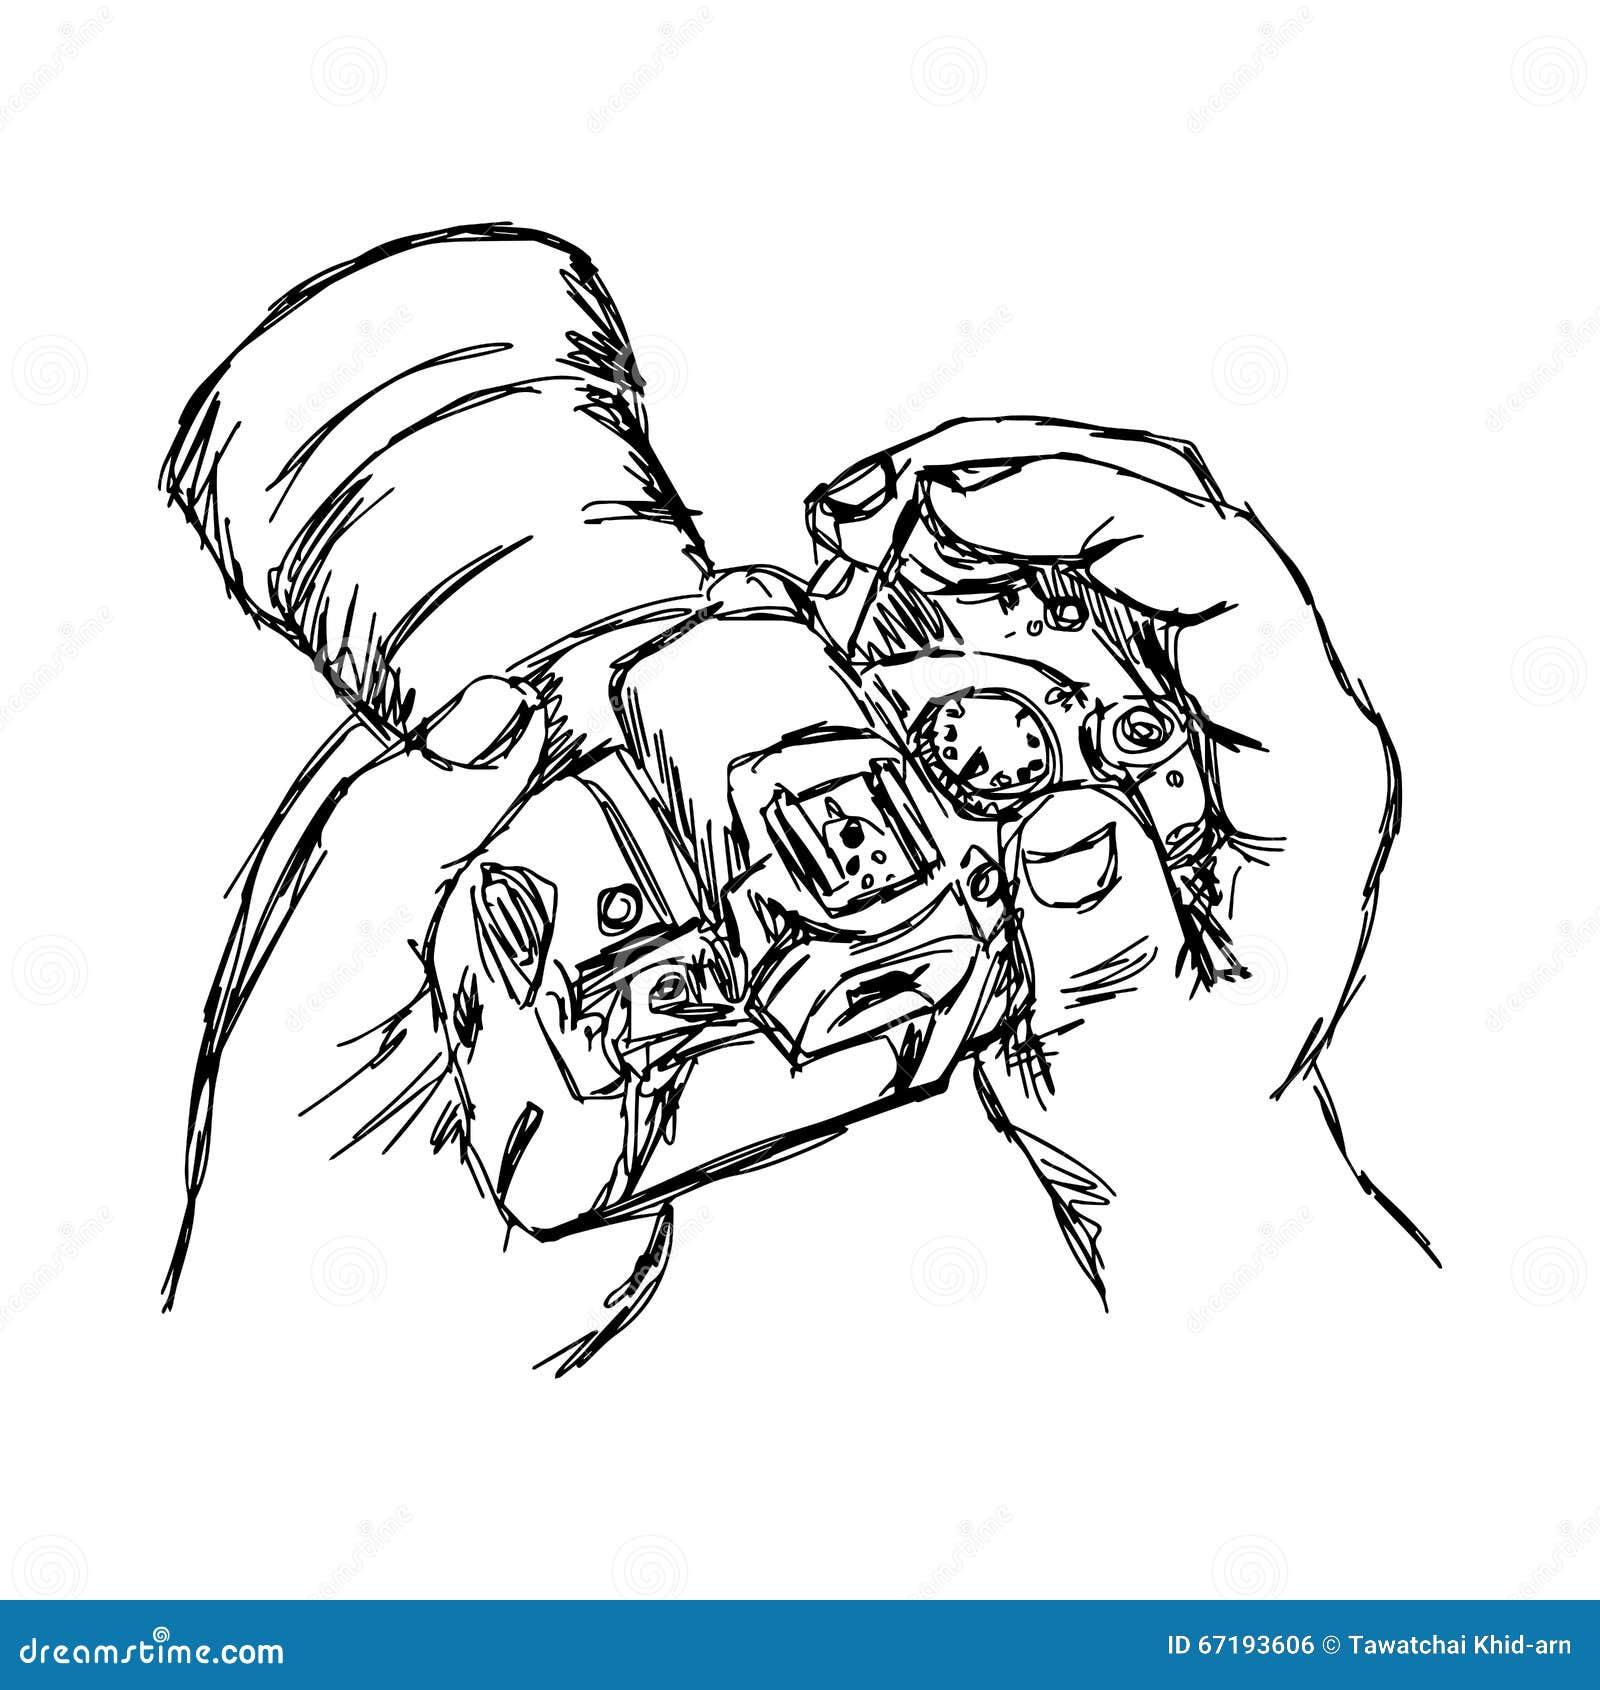 illustration vector doodle hand drawn of sketch hand holding cam Hot Web Camera illustration vector doodle hand drawn of sketch hand holding cam